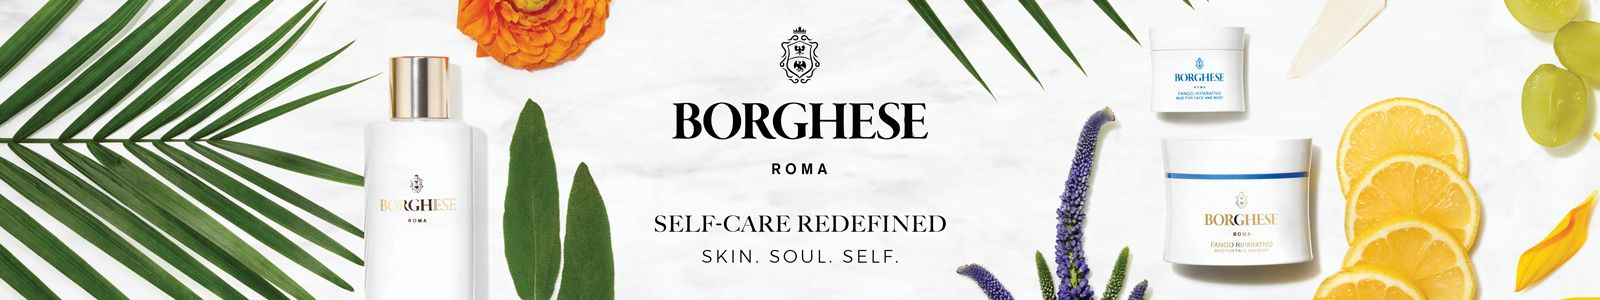 Borghese, Roma, Self-Care Redefined